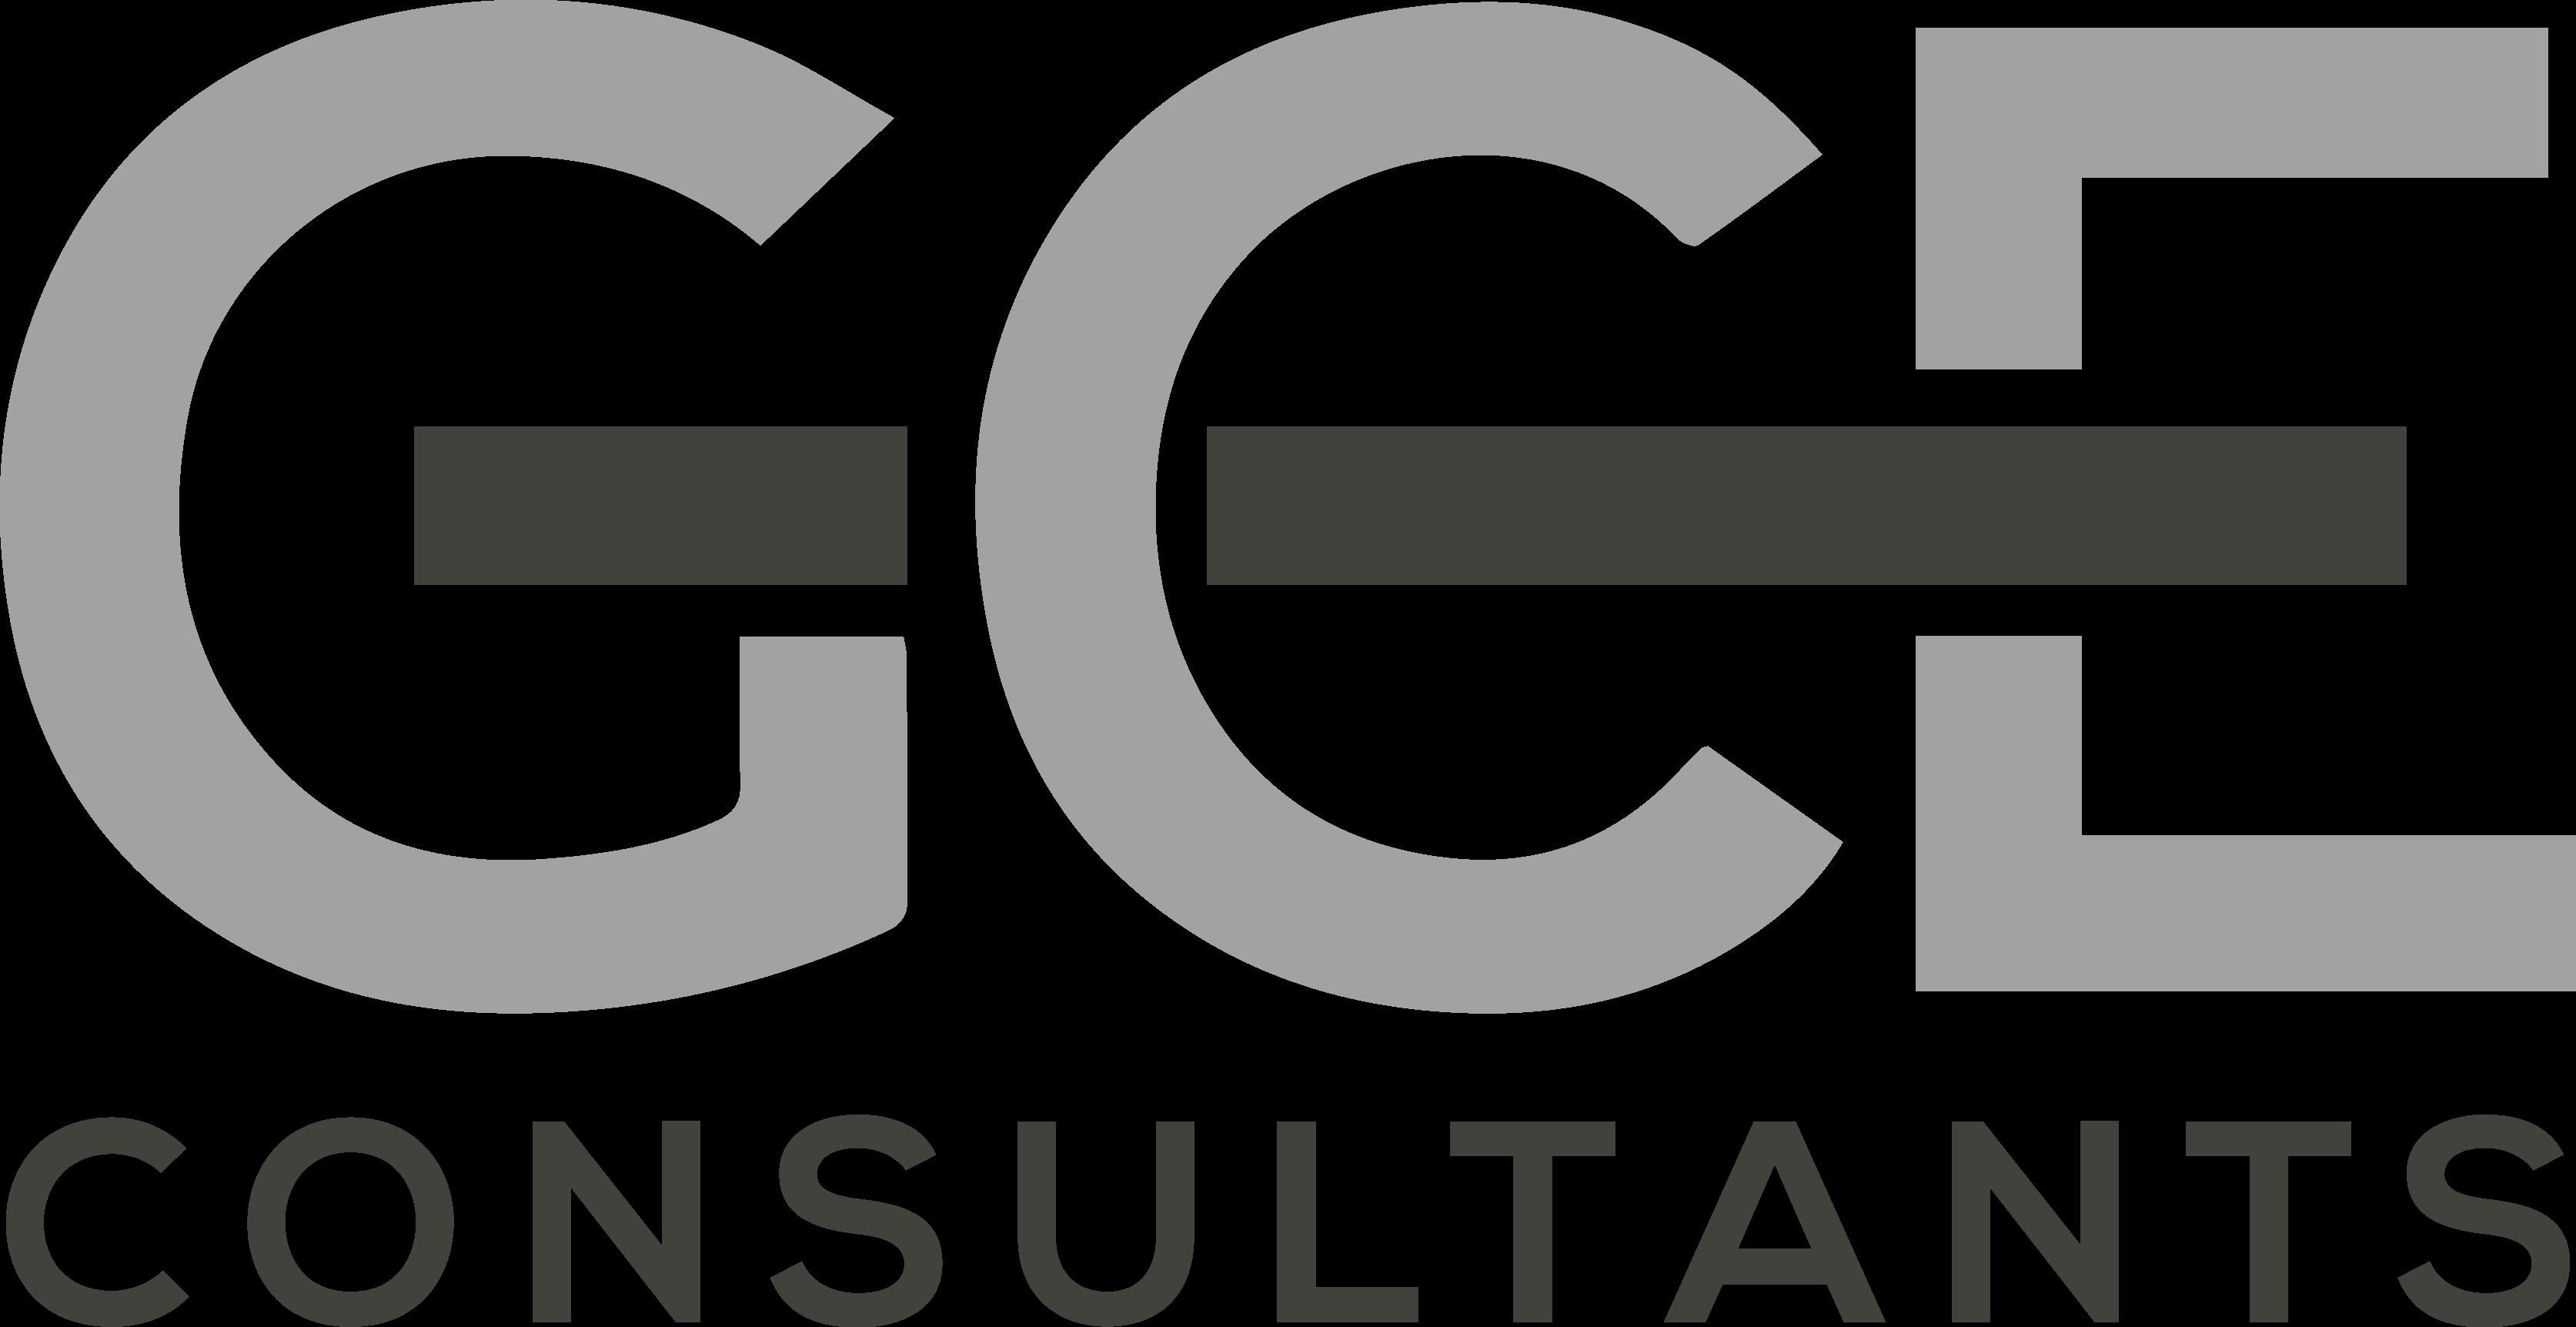 GCE Consultants